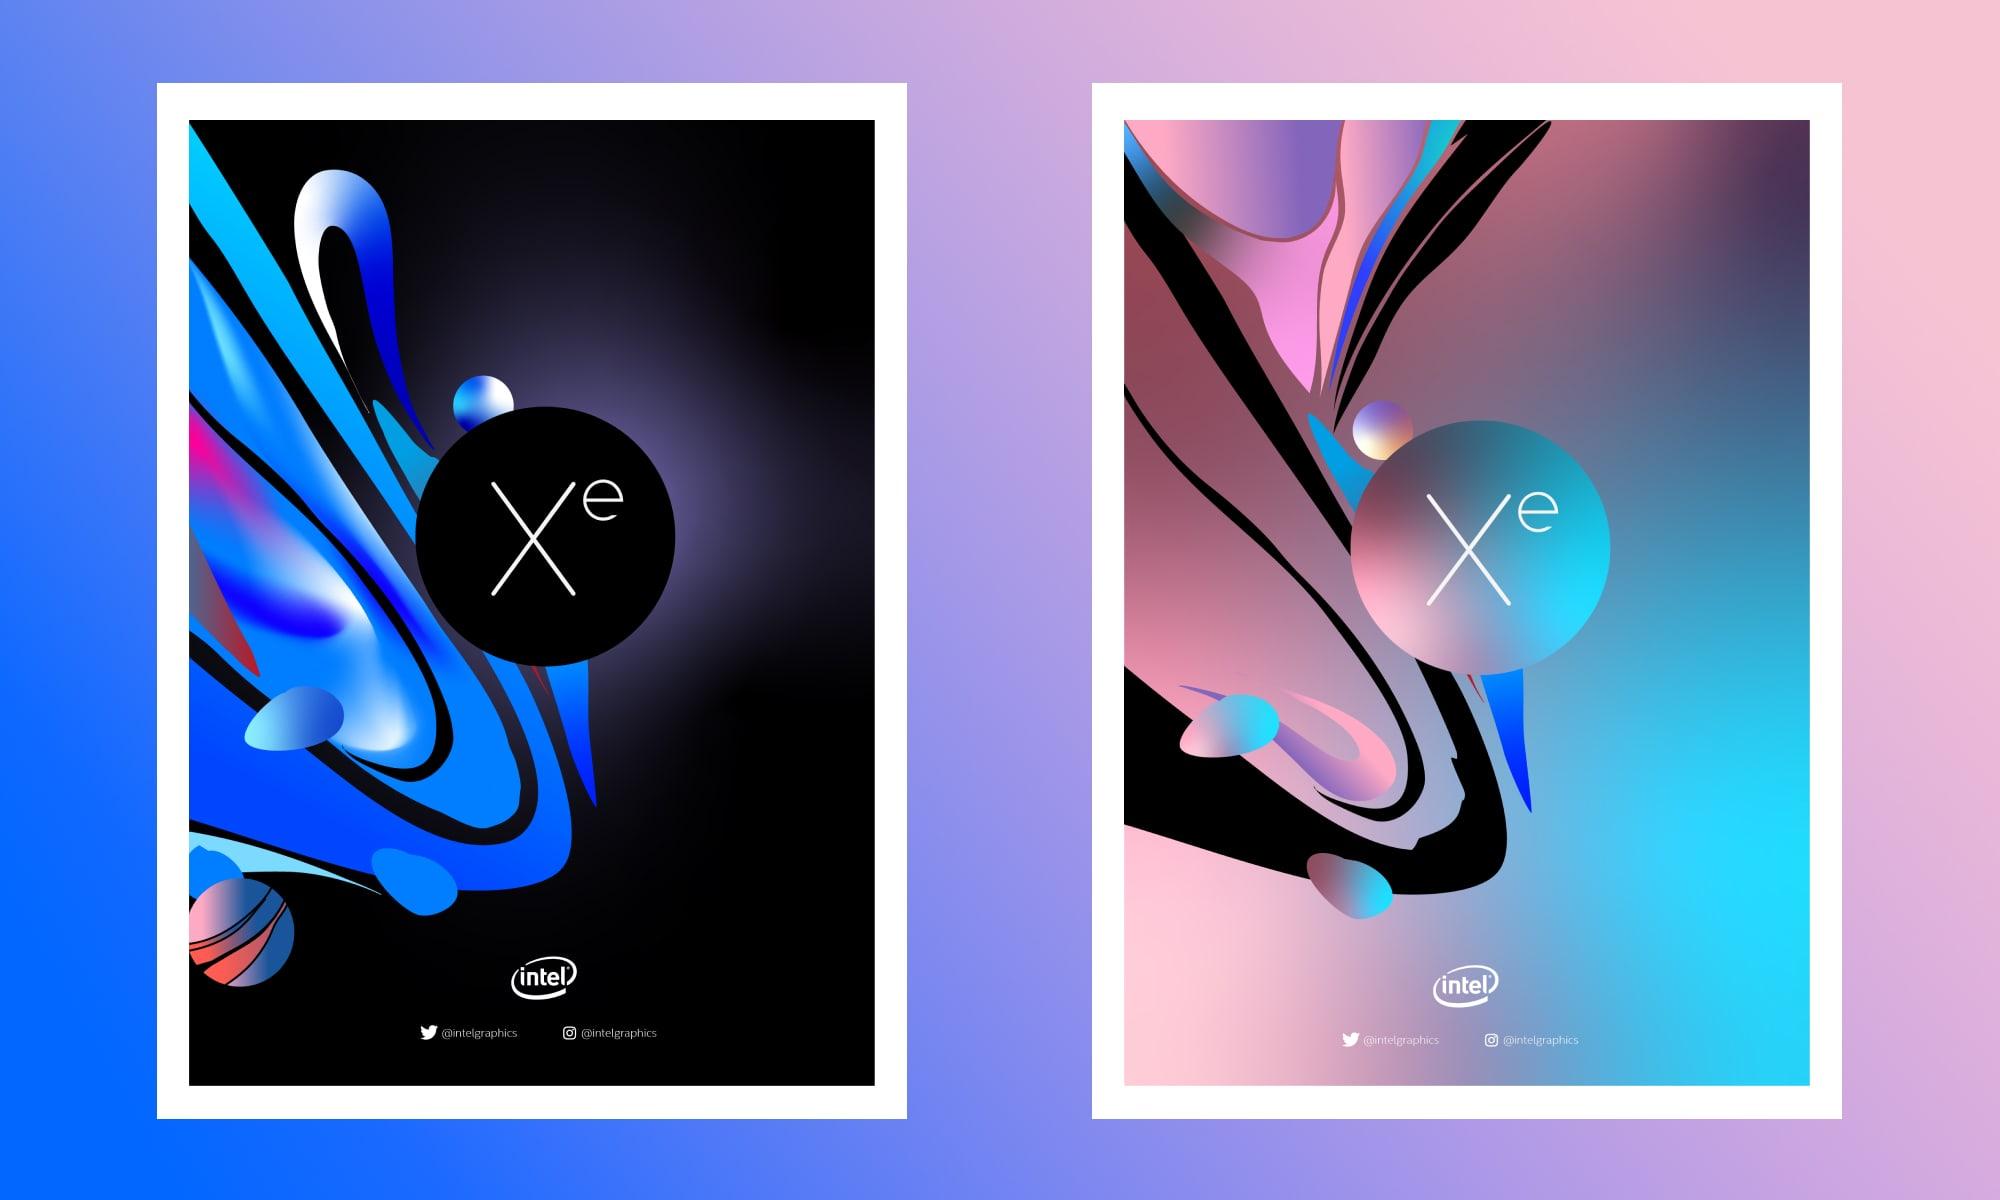 Pablo Ladosa_ Intel_Design 3